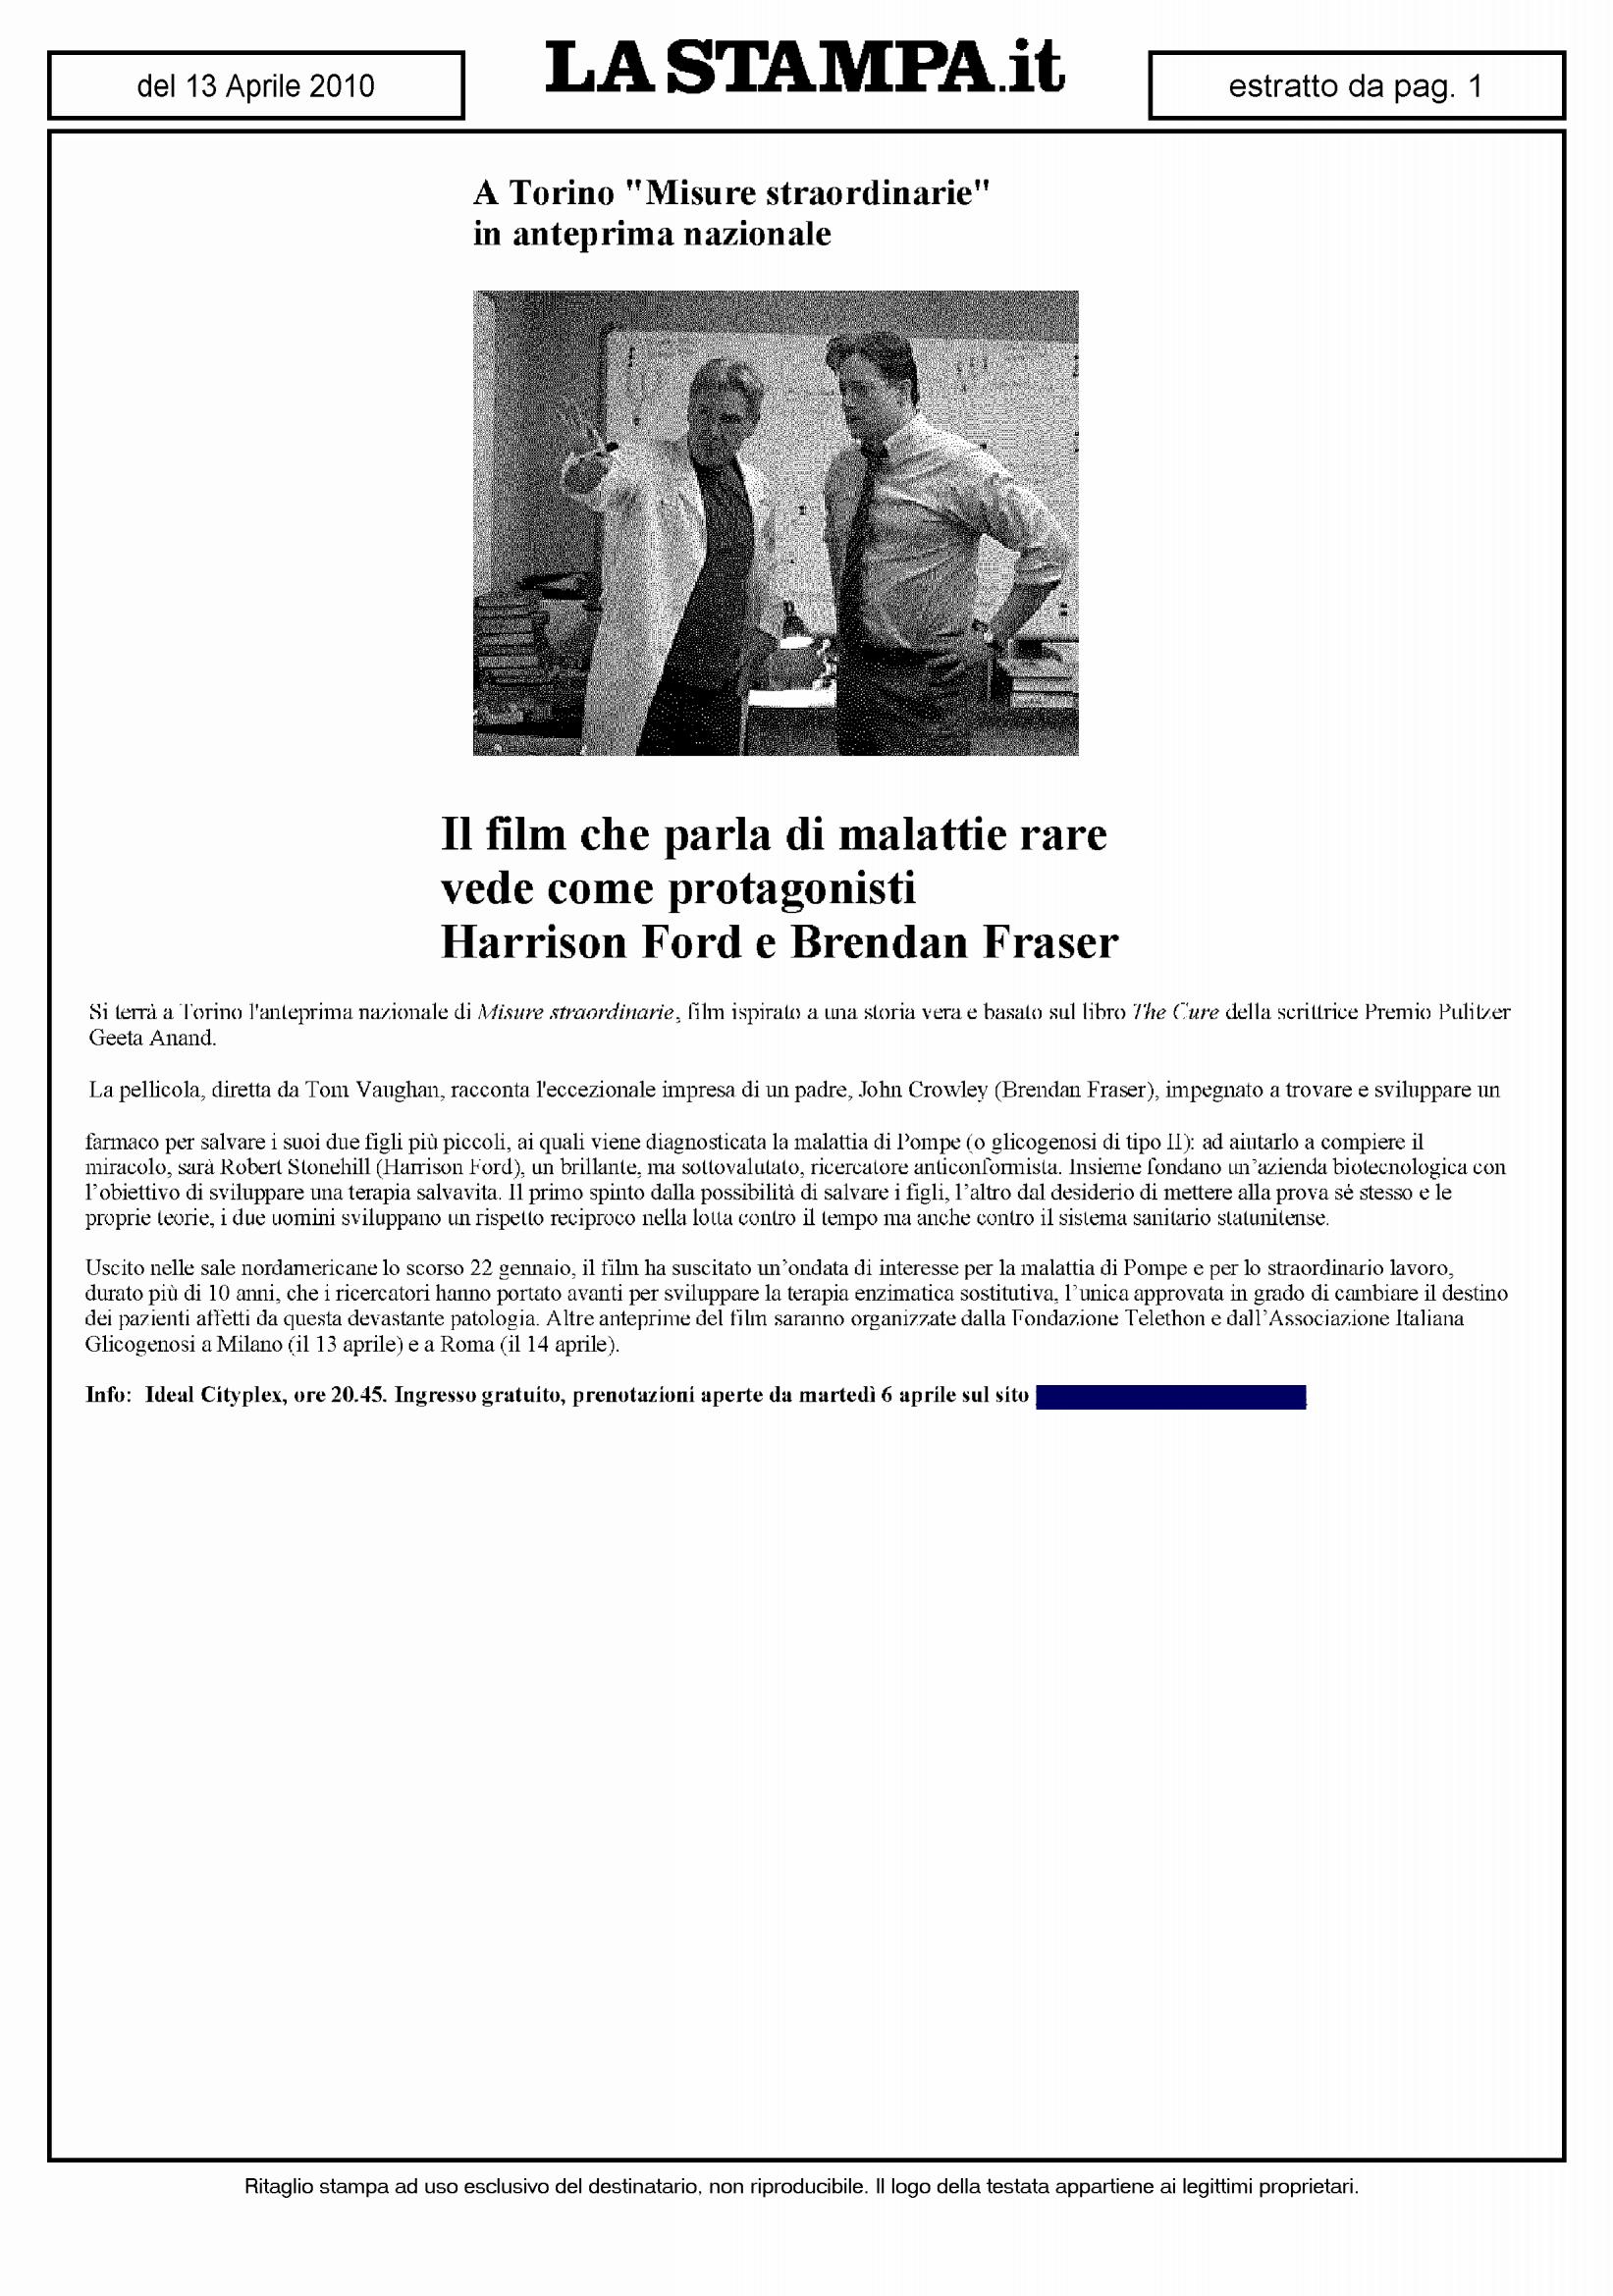 Stampa_20100422_misure straordinarie_Page_47